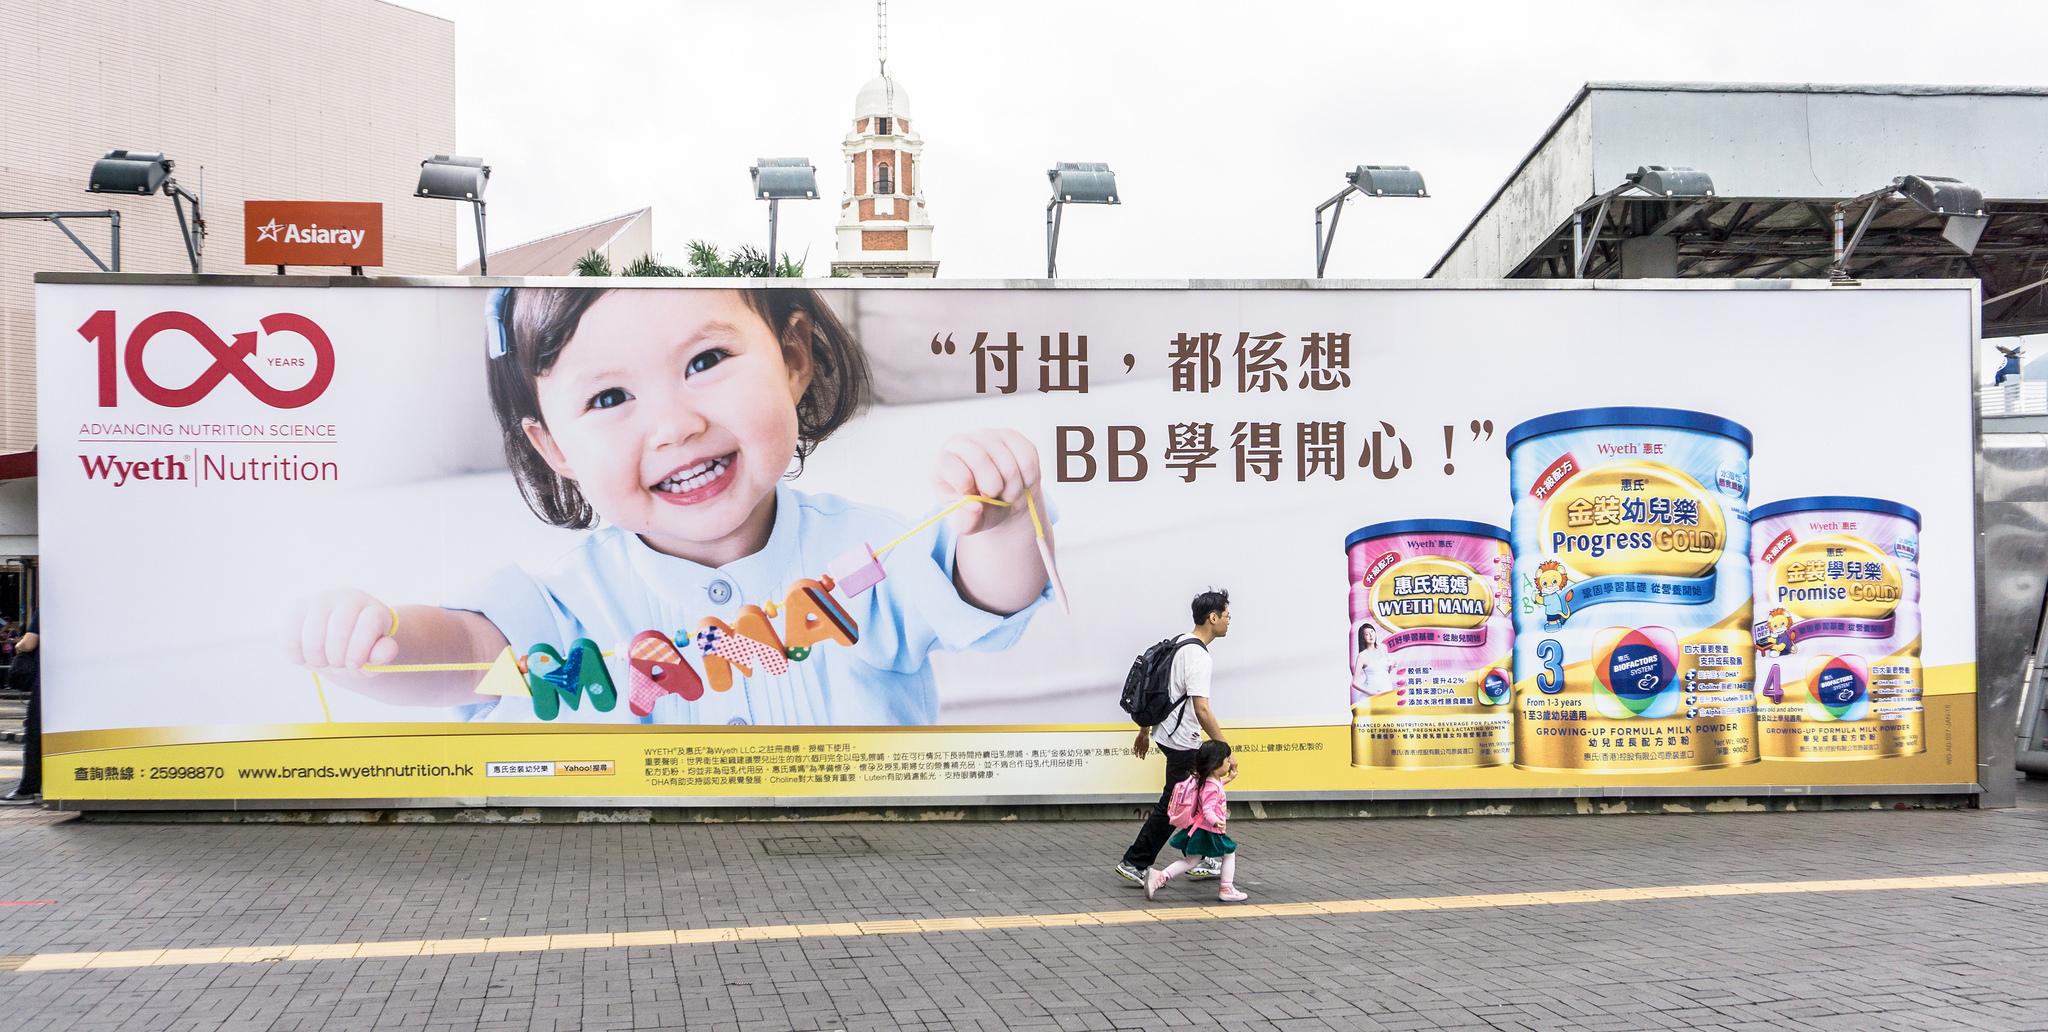 Baby Formula Advert in HK   ©IQRemix/Flickr